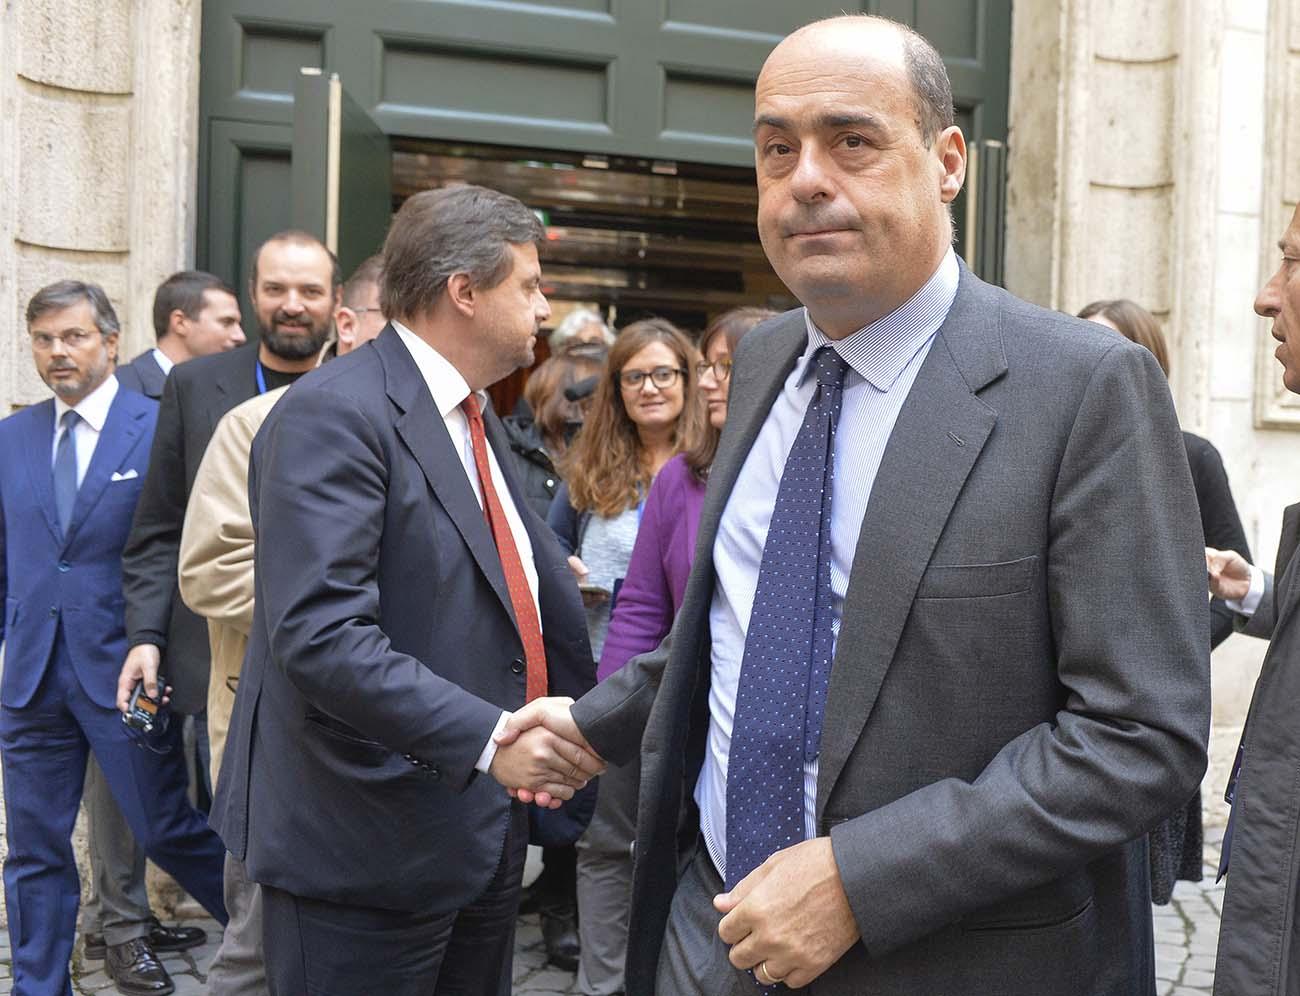 Carlo Calenda, Nicola Zingaretti